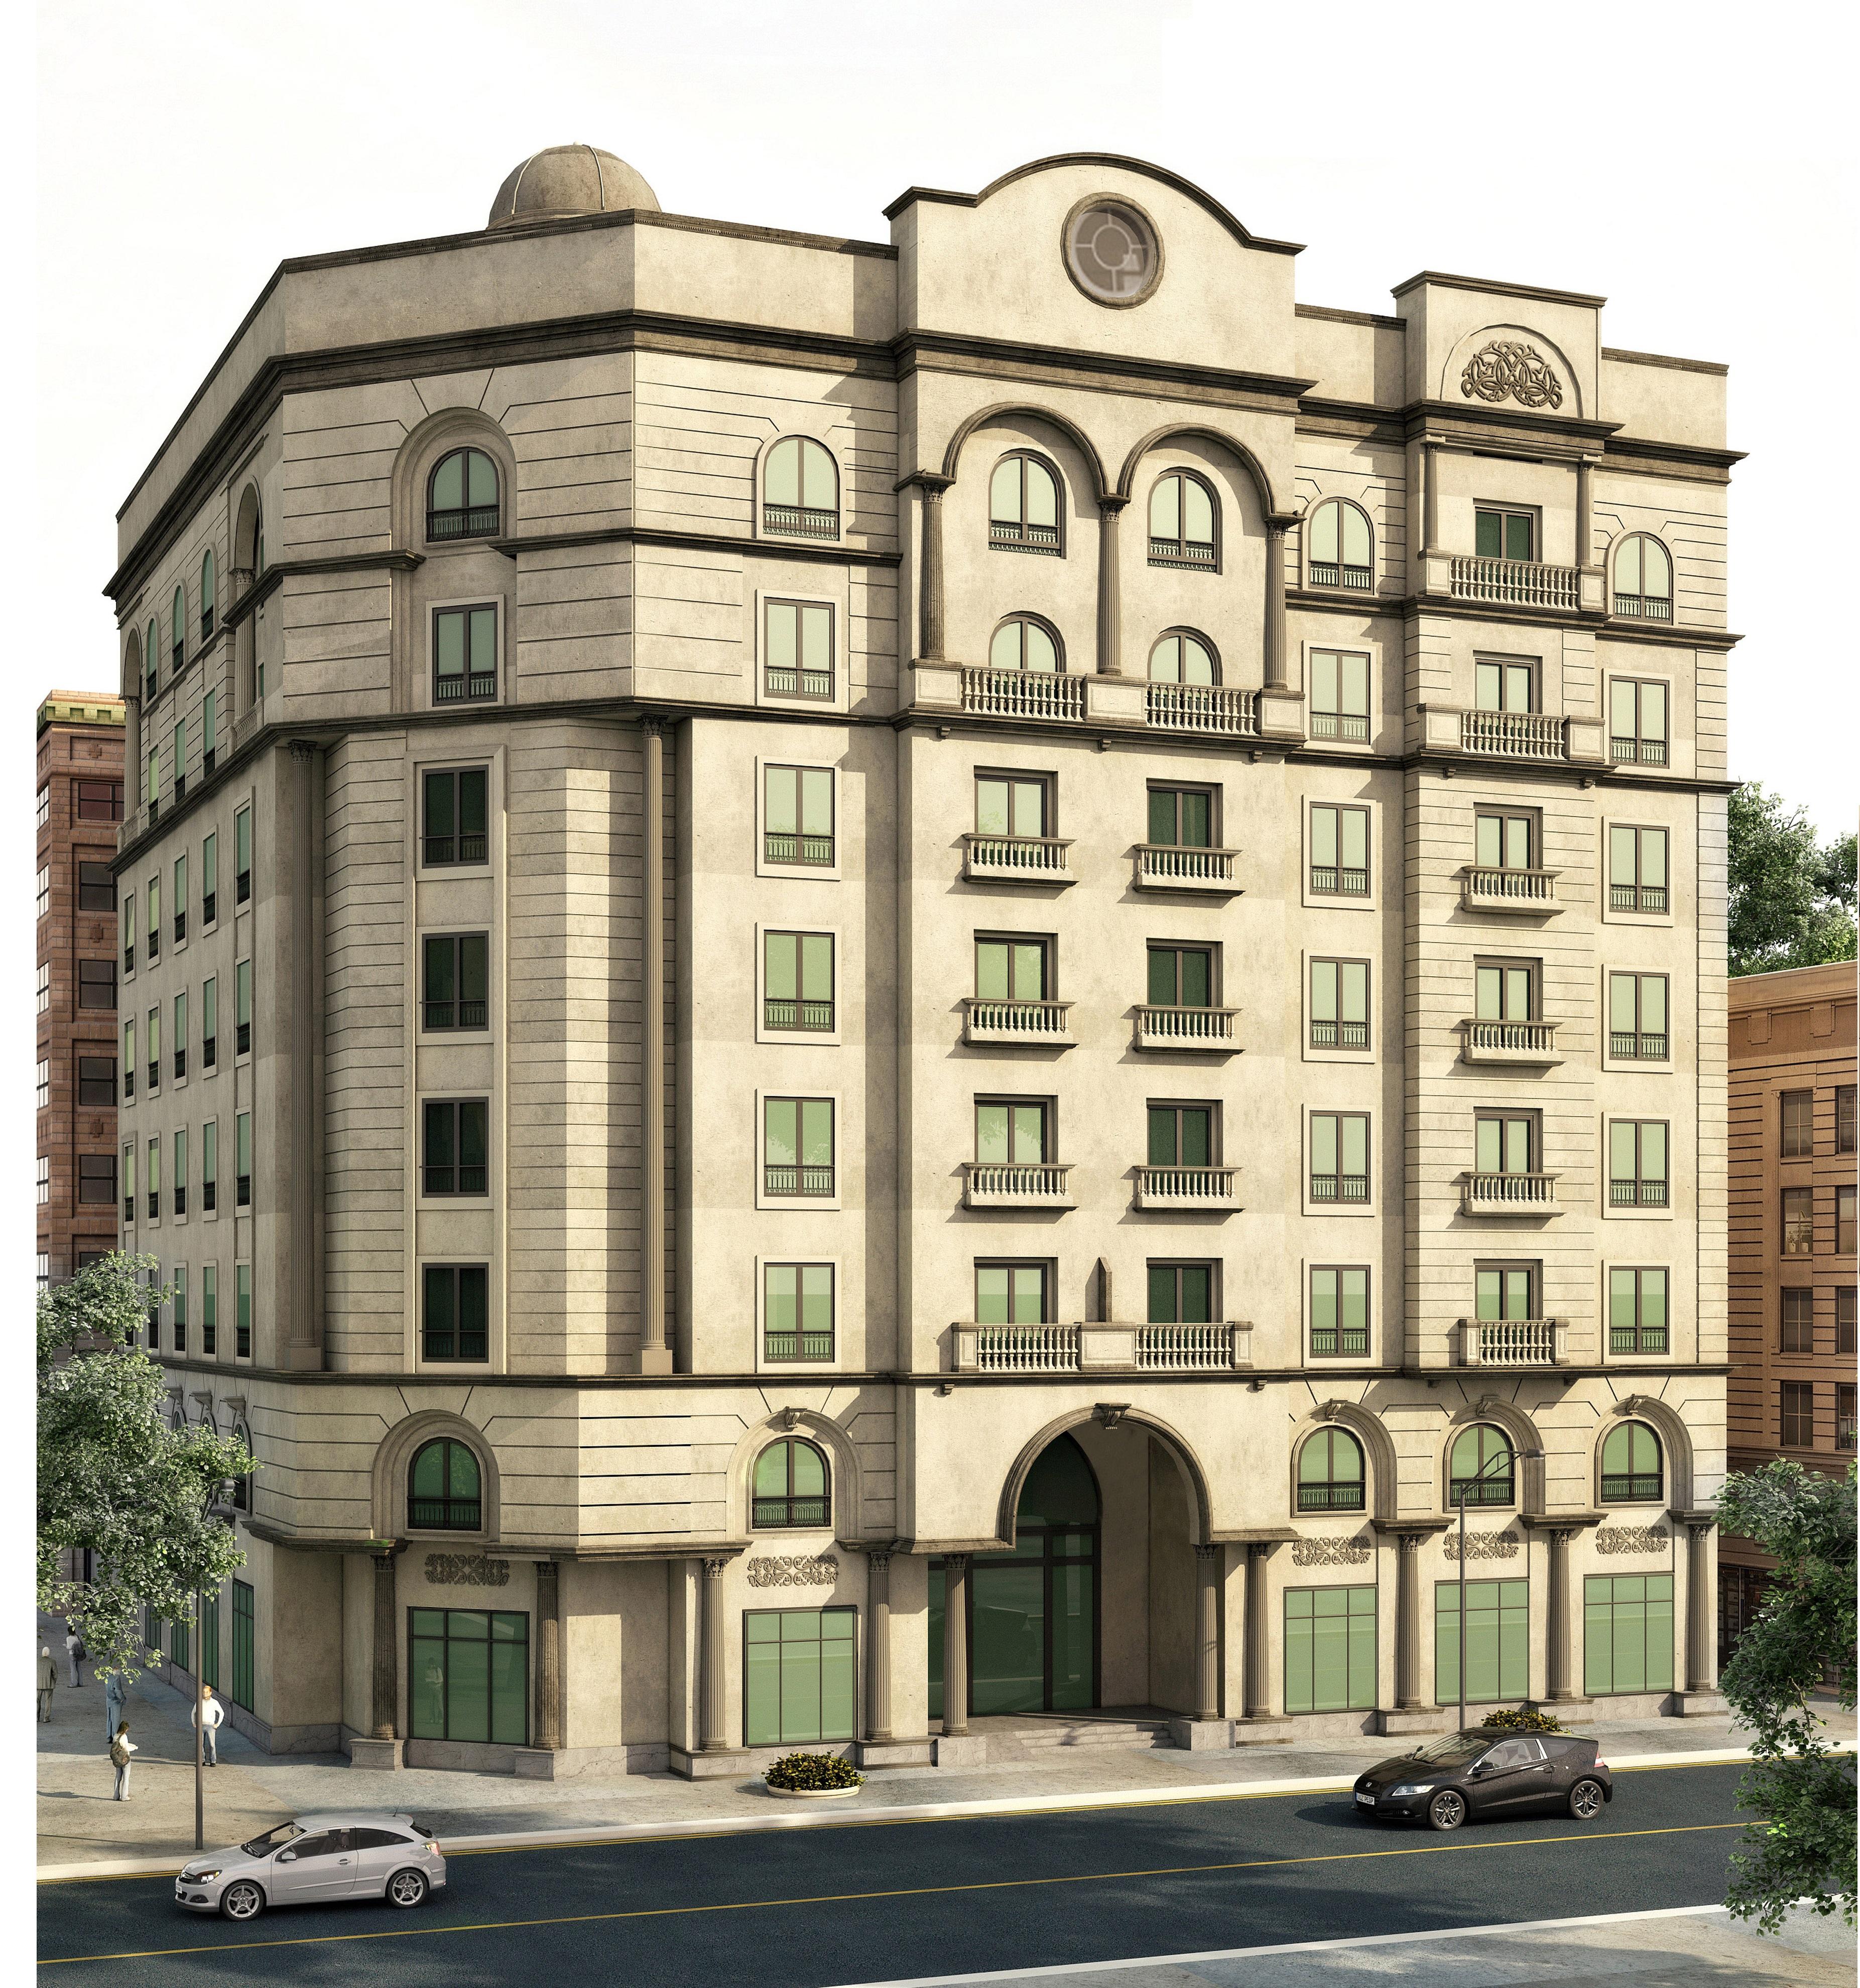 AL NAJMA HOTEL BUILDING